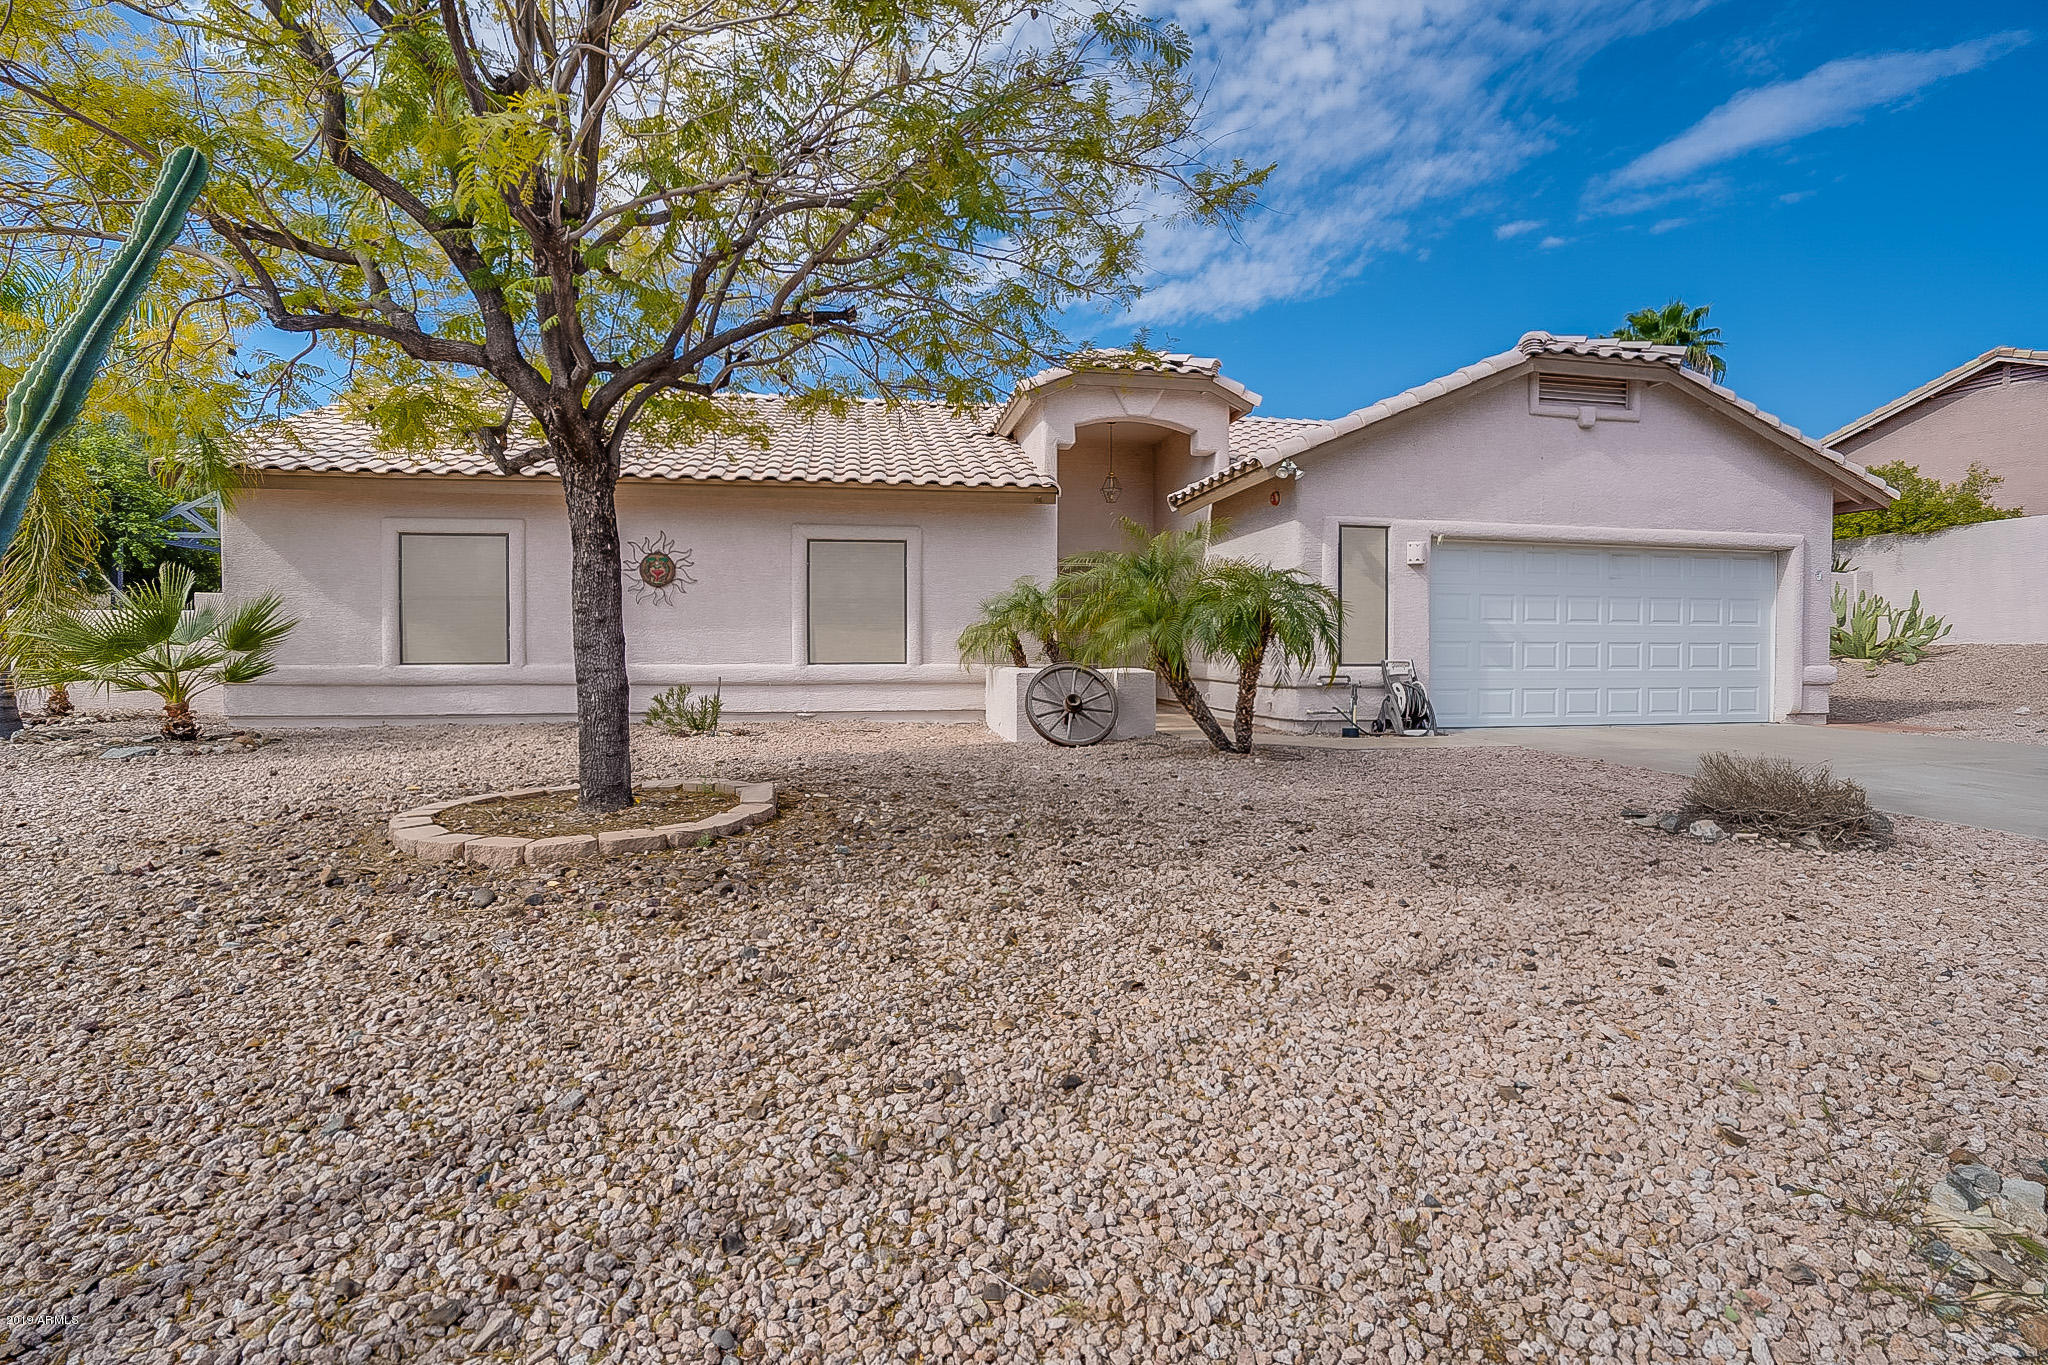 Photo of 16457 E BAINBRIDGE Avenue, Fountain Hills, AZ 85268